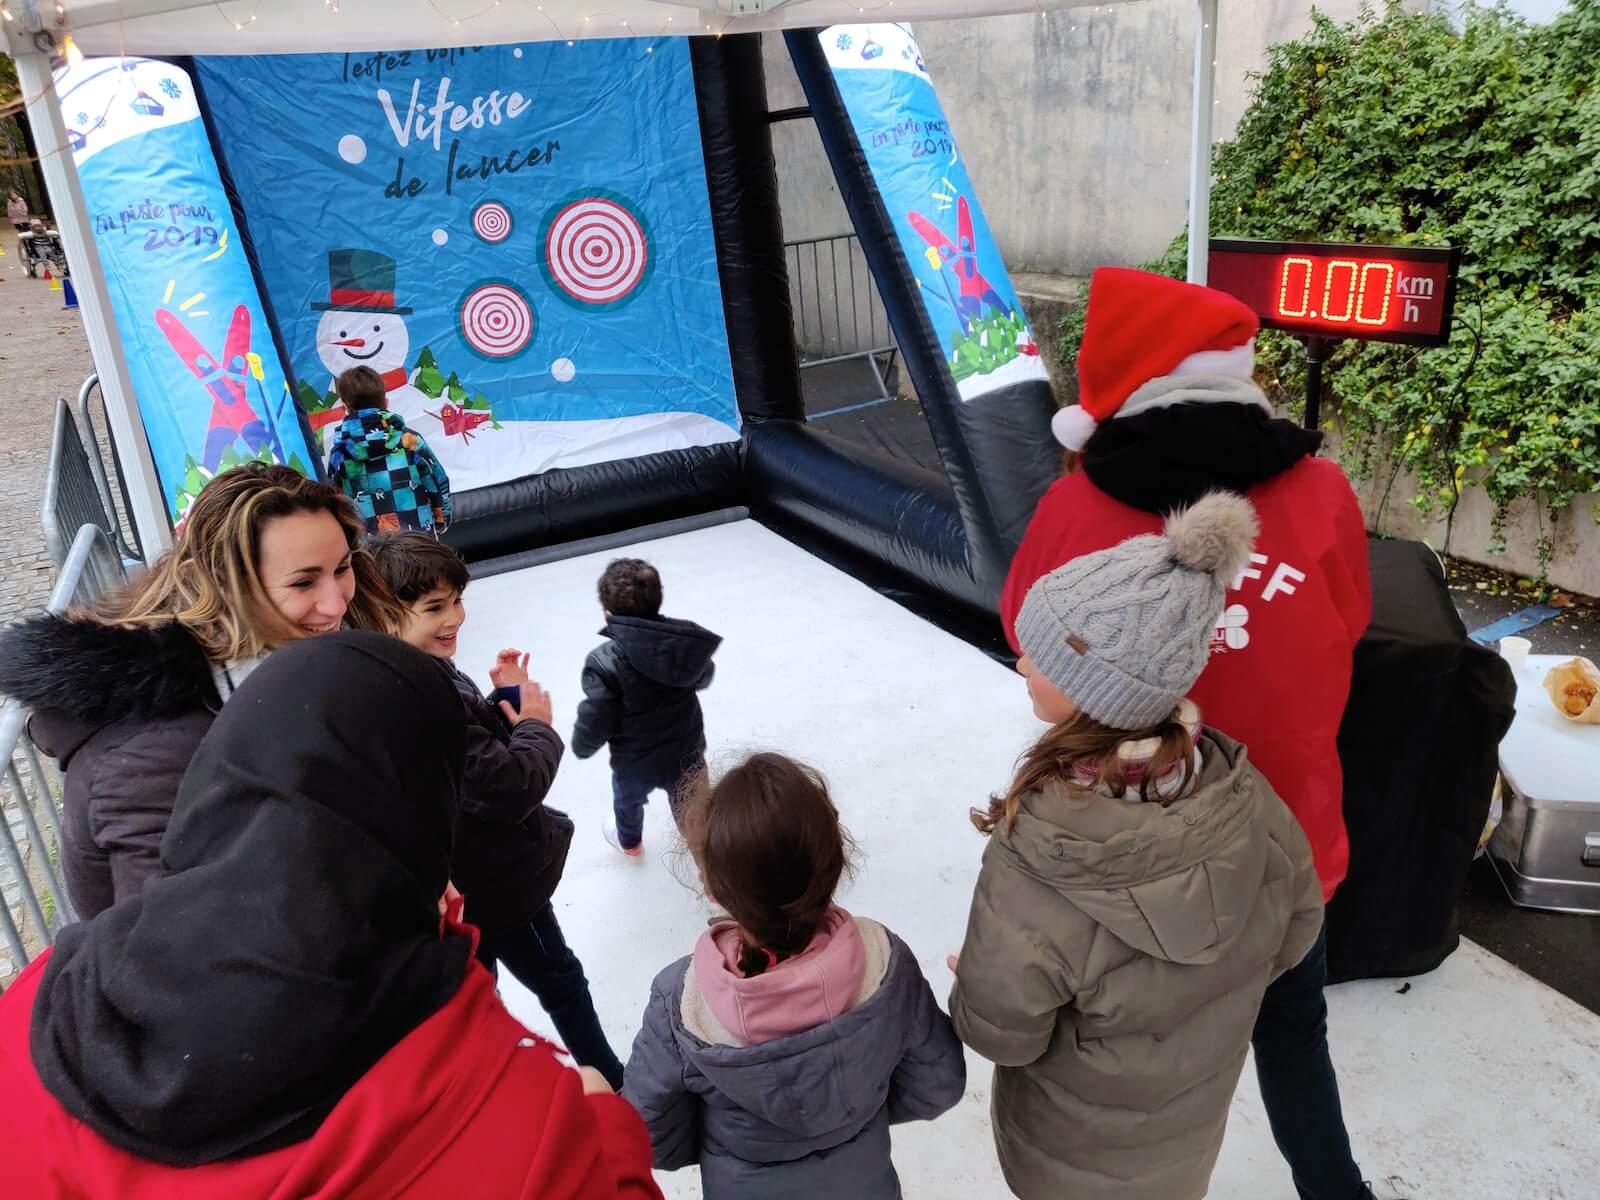 Lancer sport neige glisse hiver Noël radar vitesse fun jeunes enfants adolescents familles